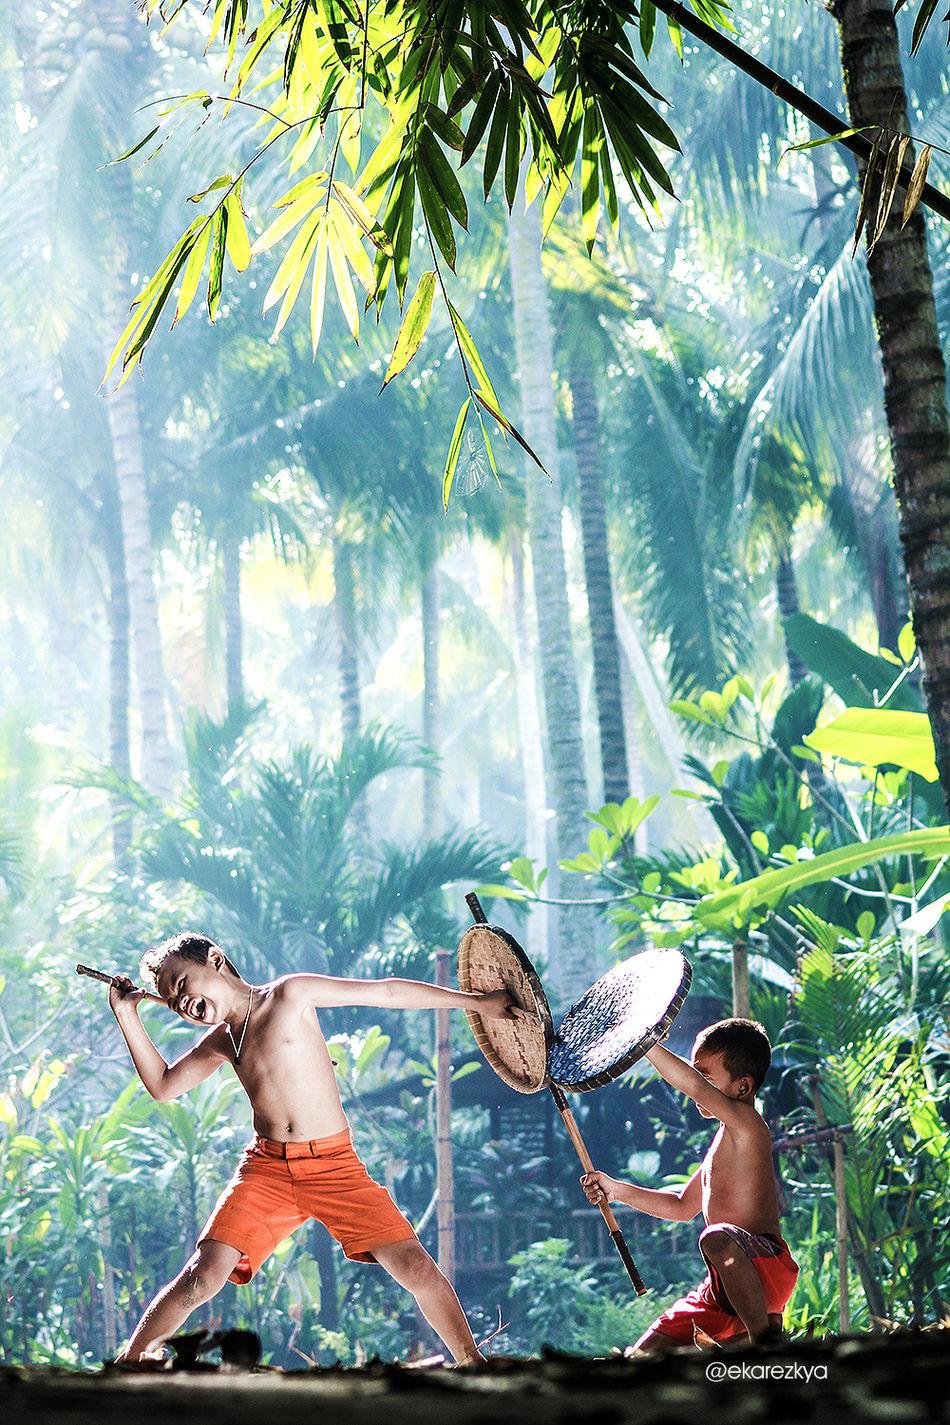 lombok island| indonesia | presean game | photography human interest |